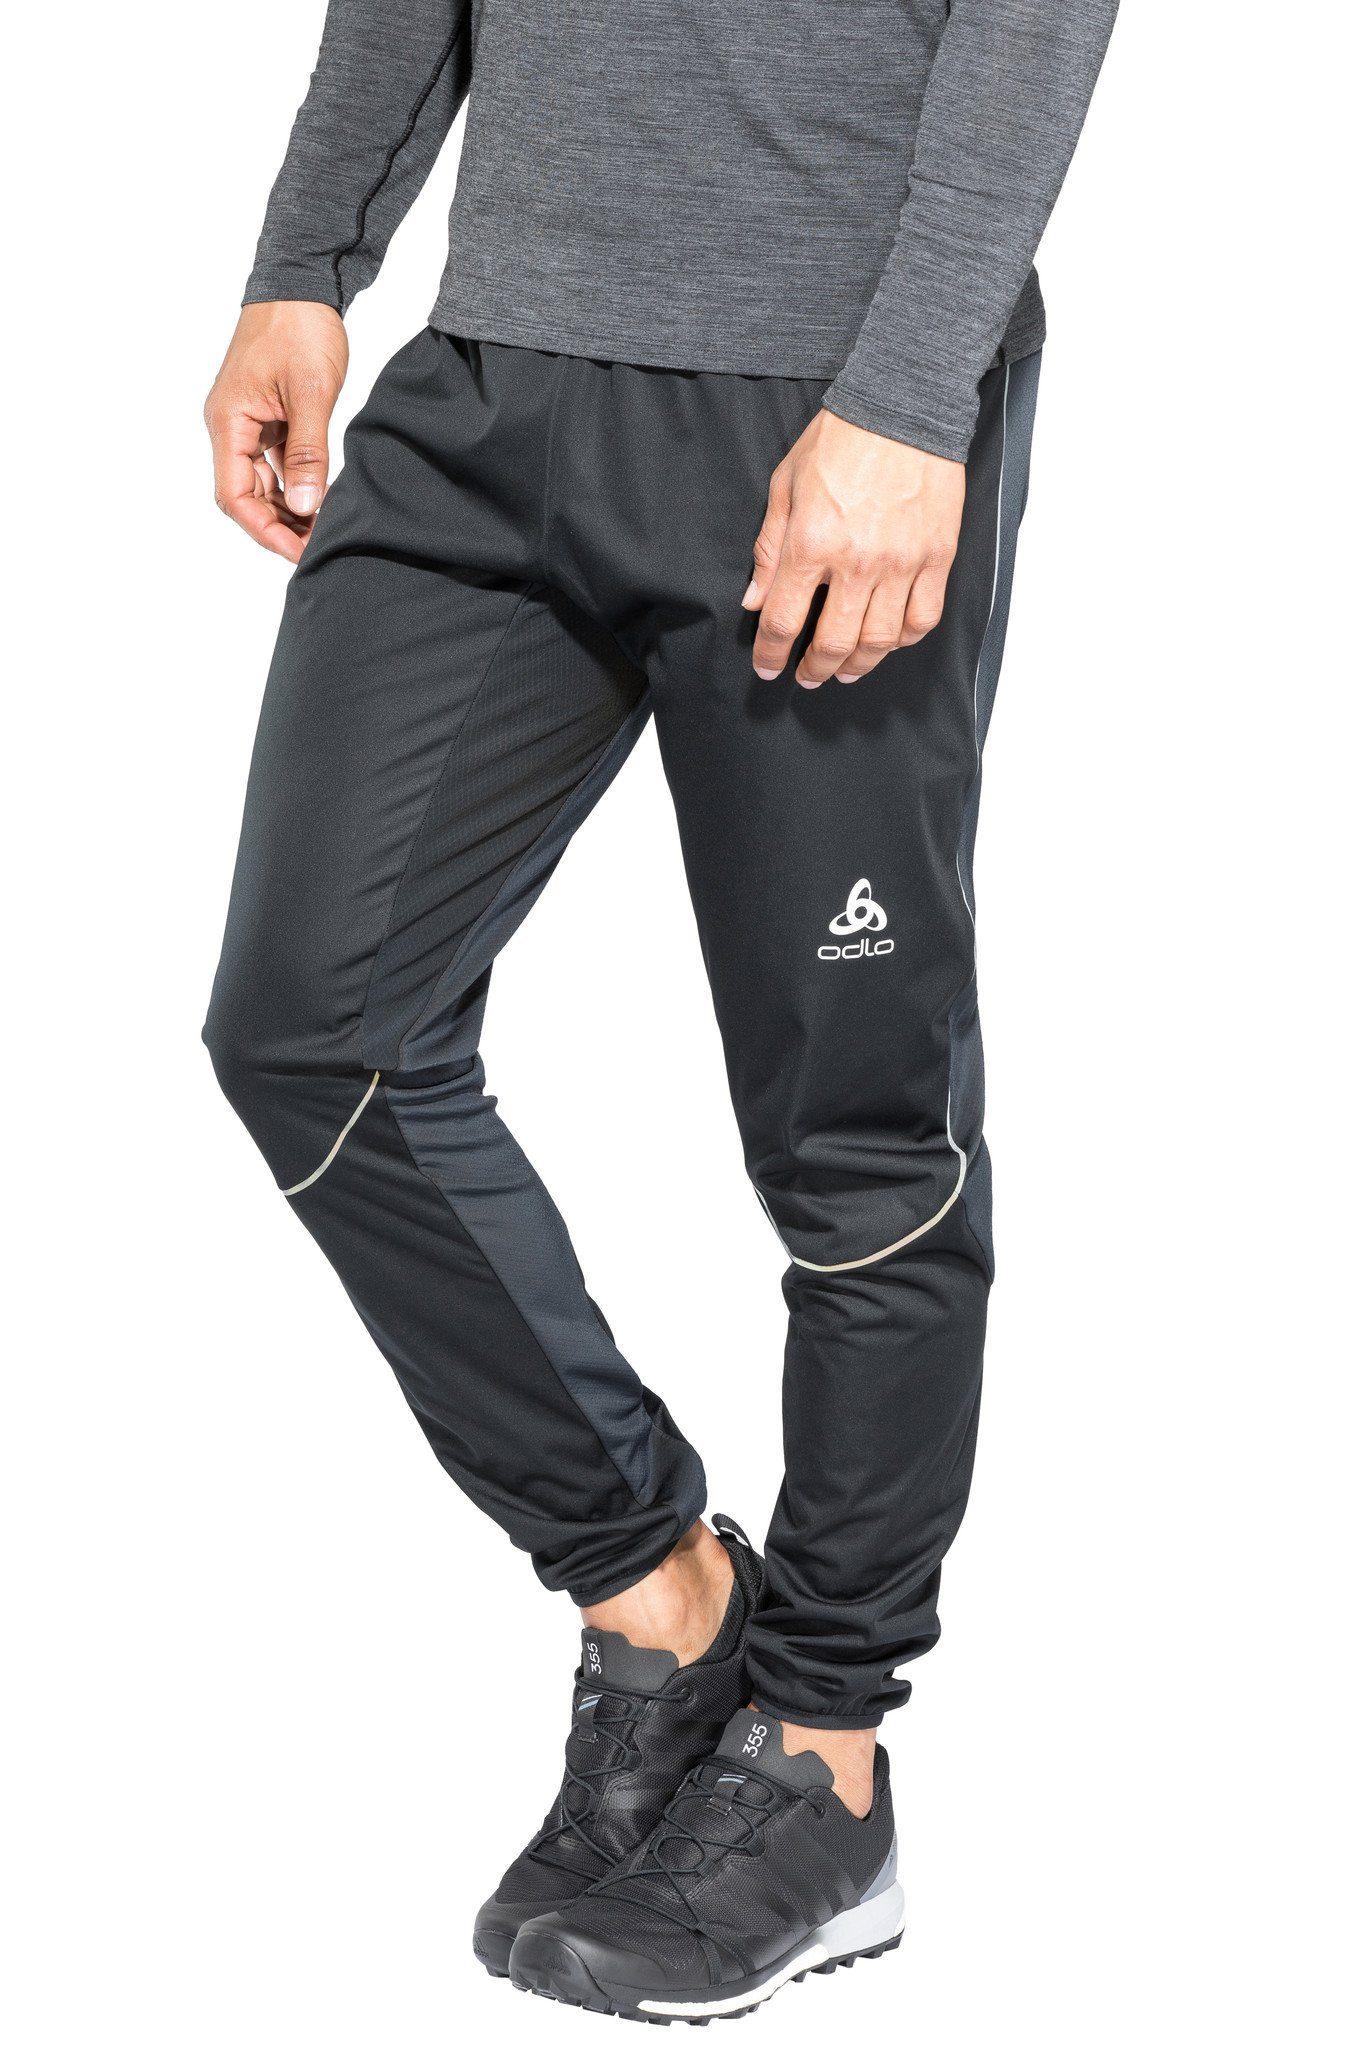 Odlo Laufhose »Zeroweight Windproof Warm Pants Herren« online kaufen | OTTO